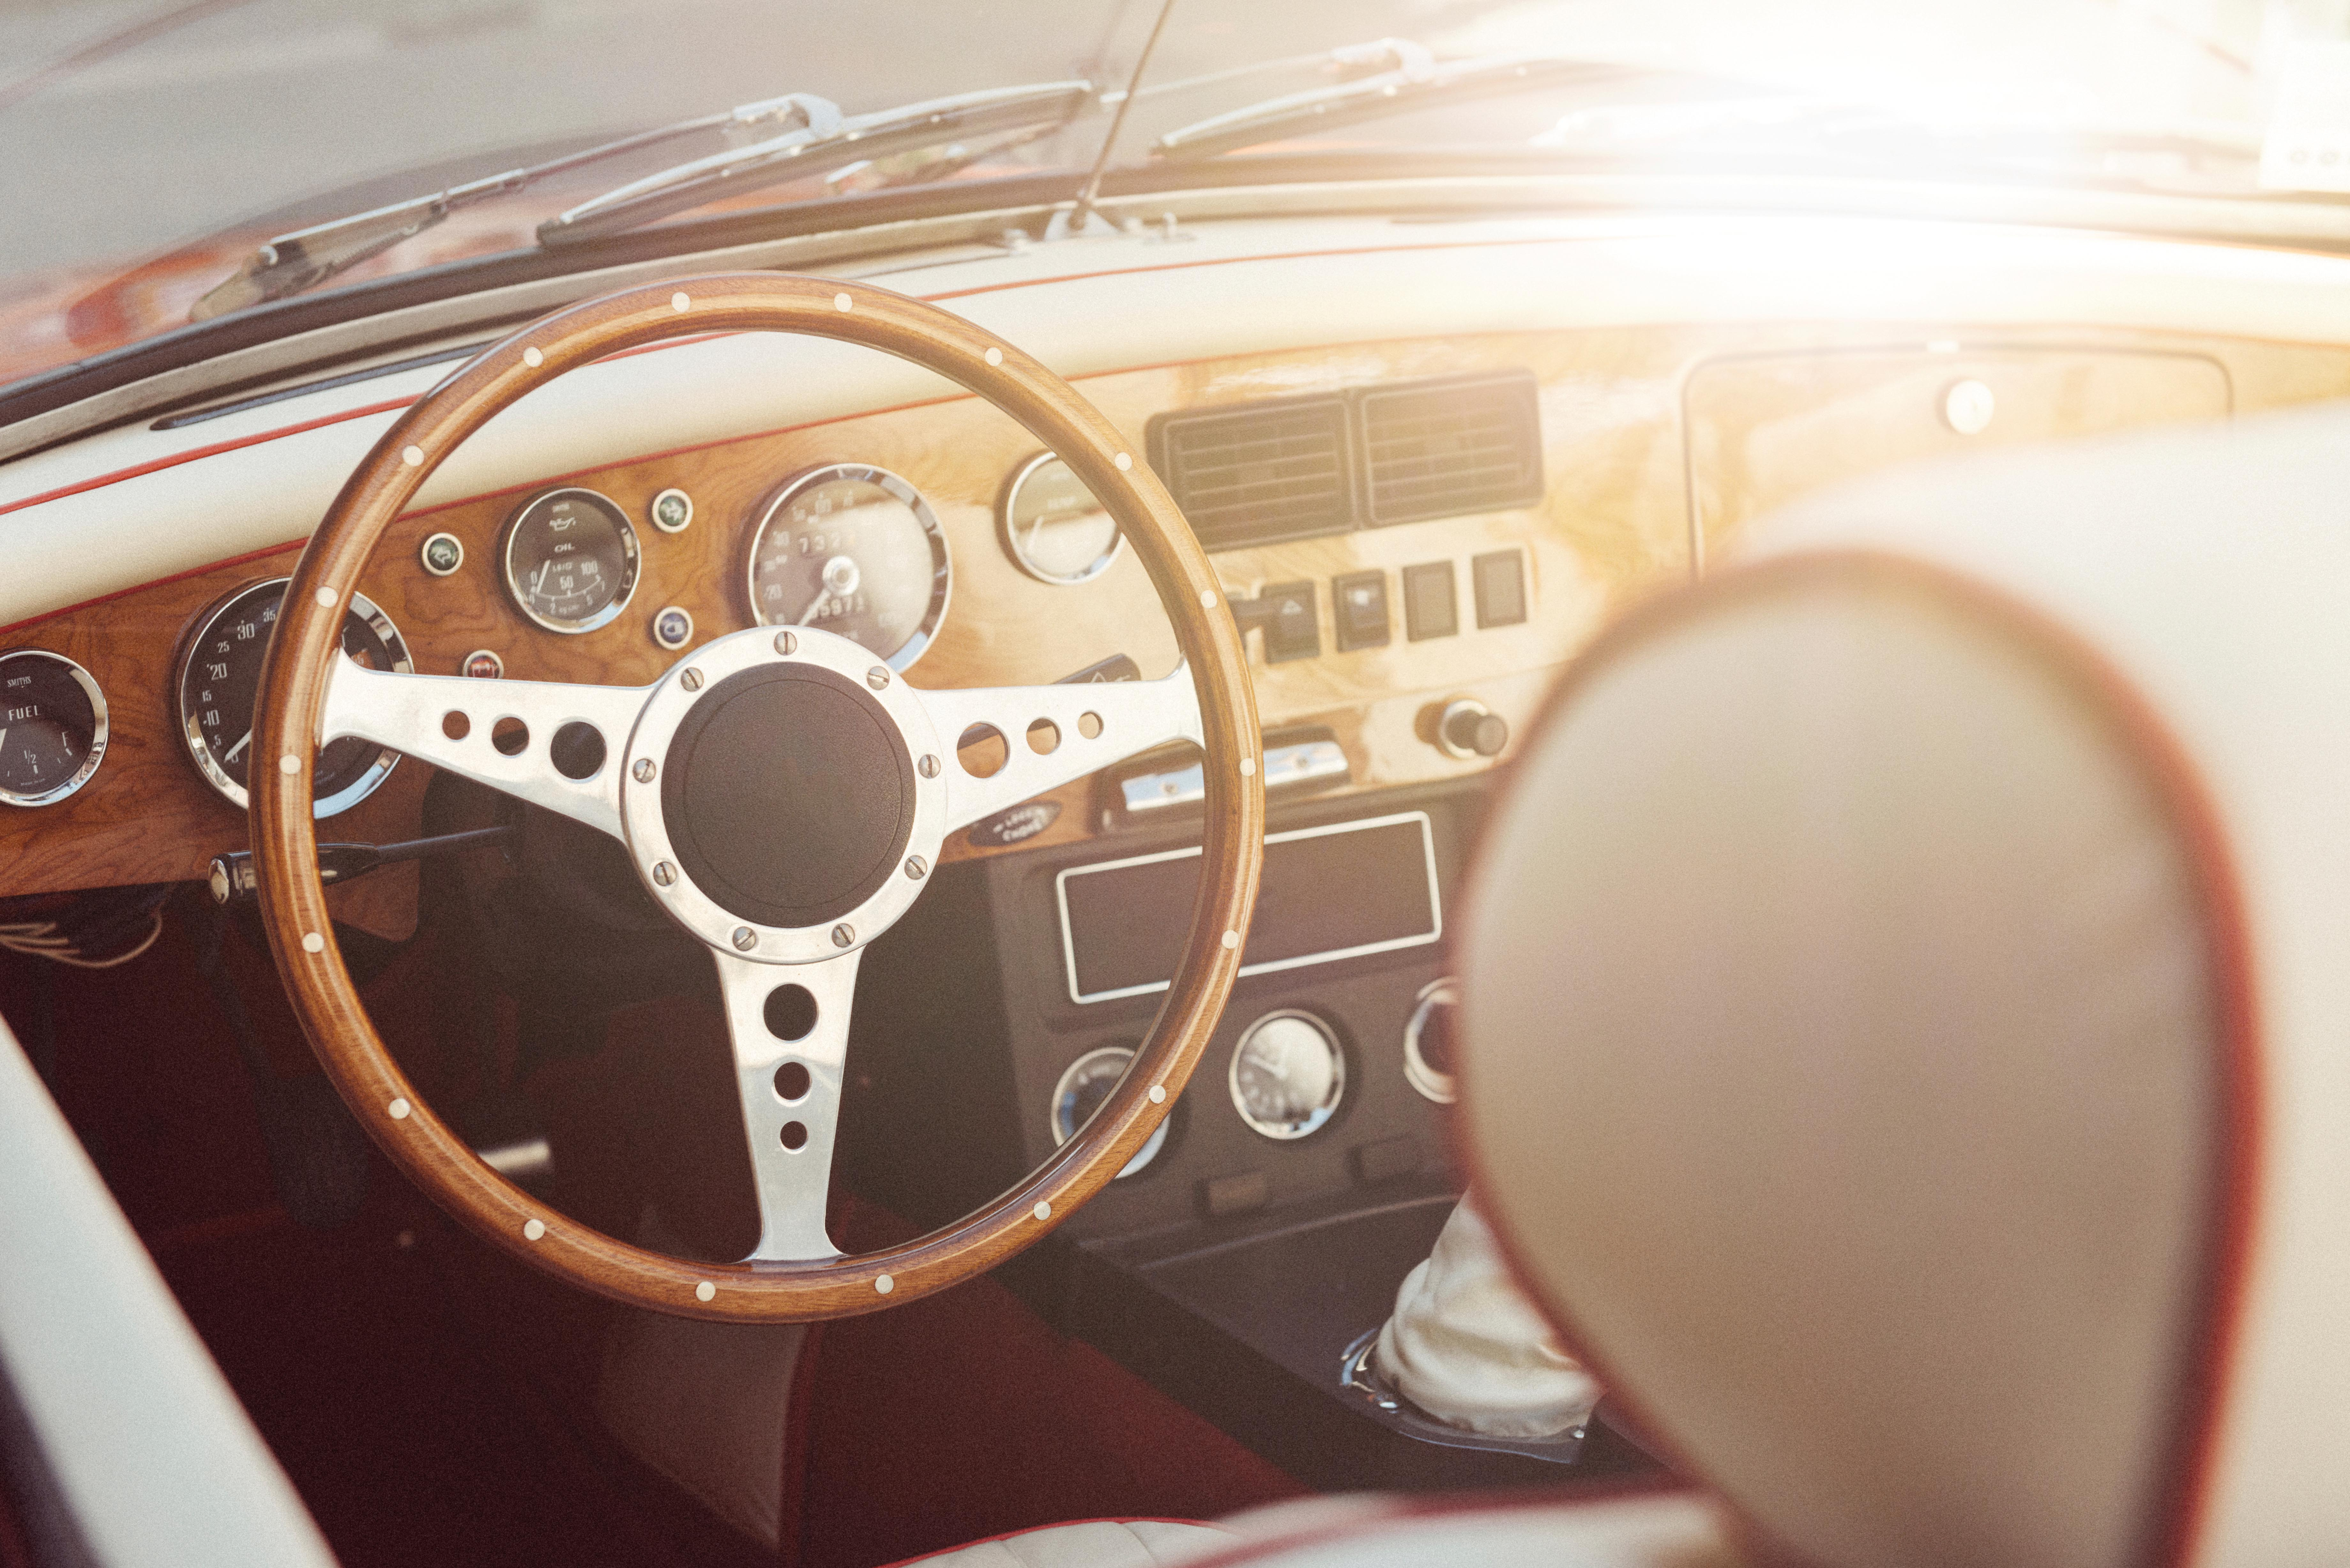 Blick in ein Oldtimer-Cockpit